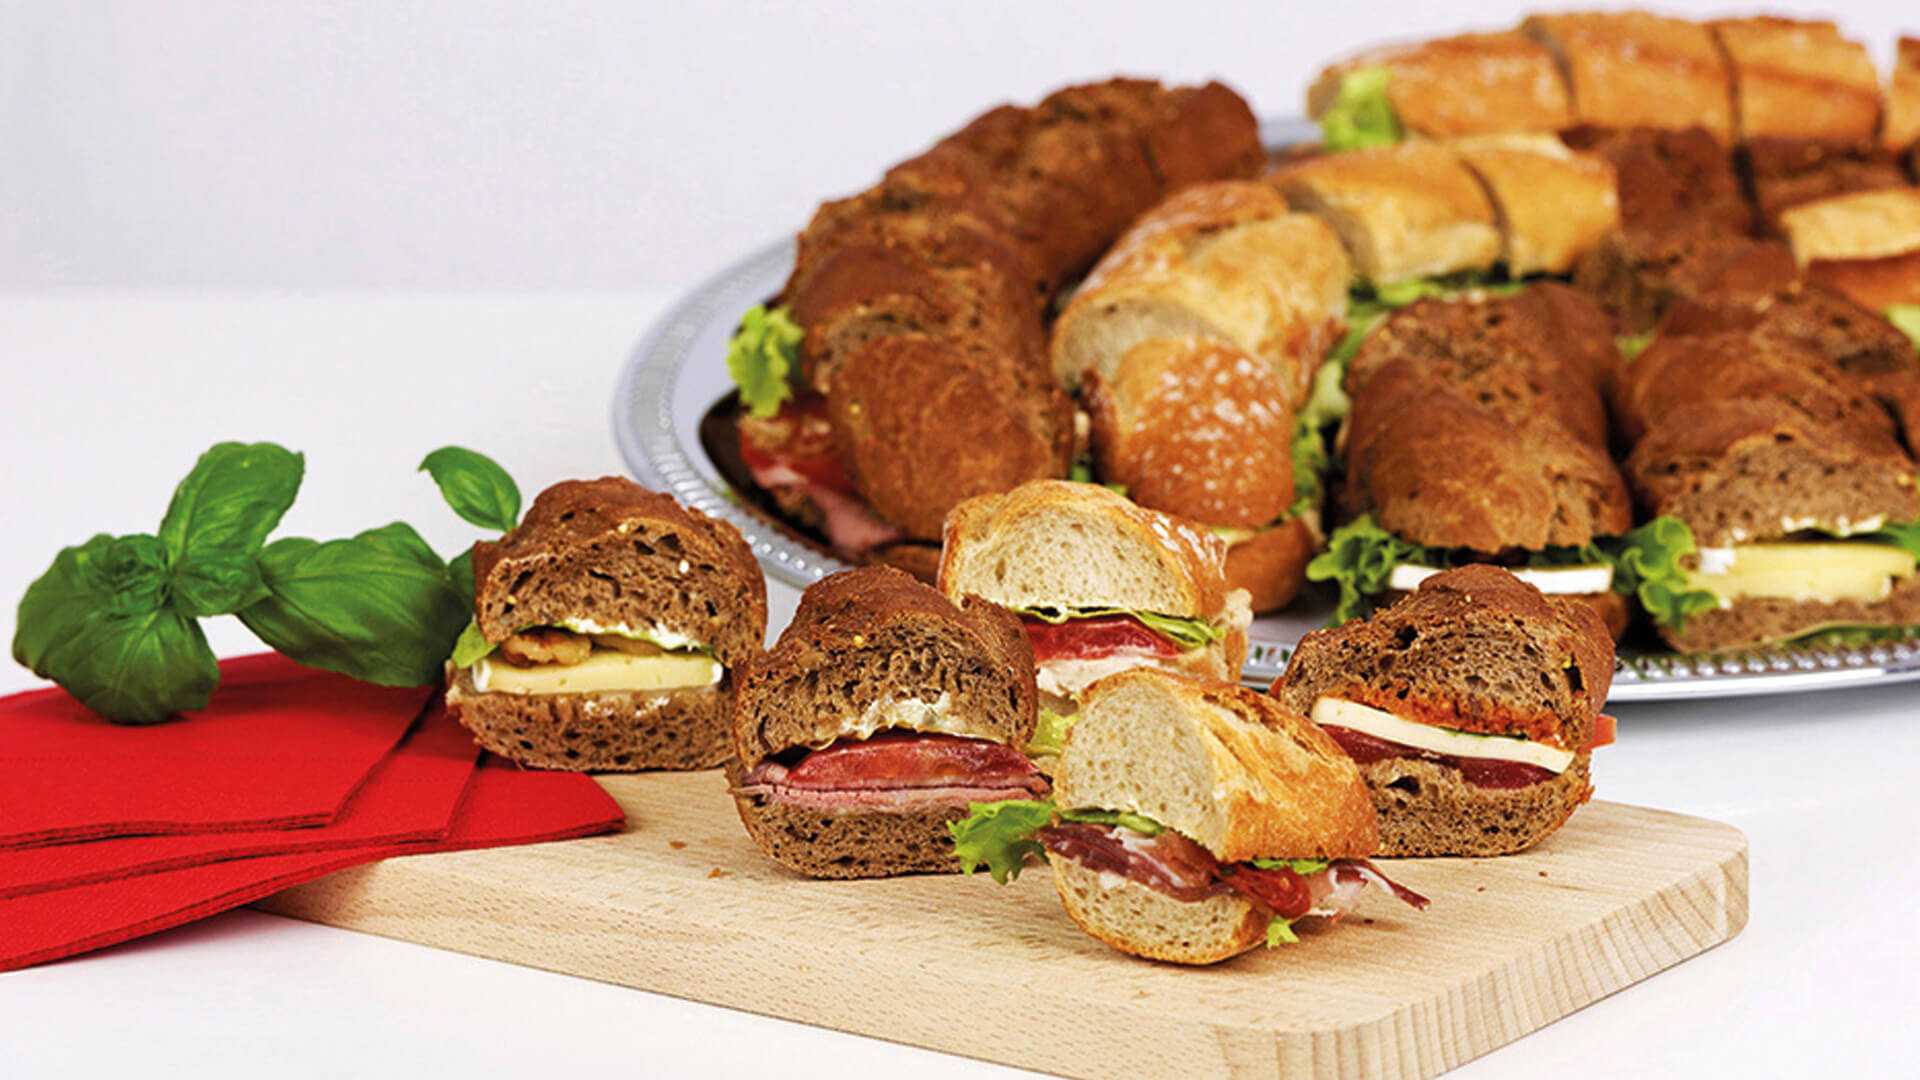 sandwichbar-sandwichplatte